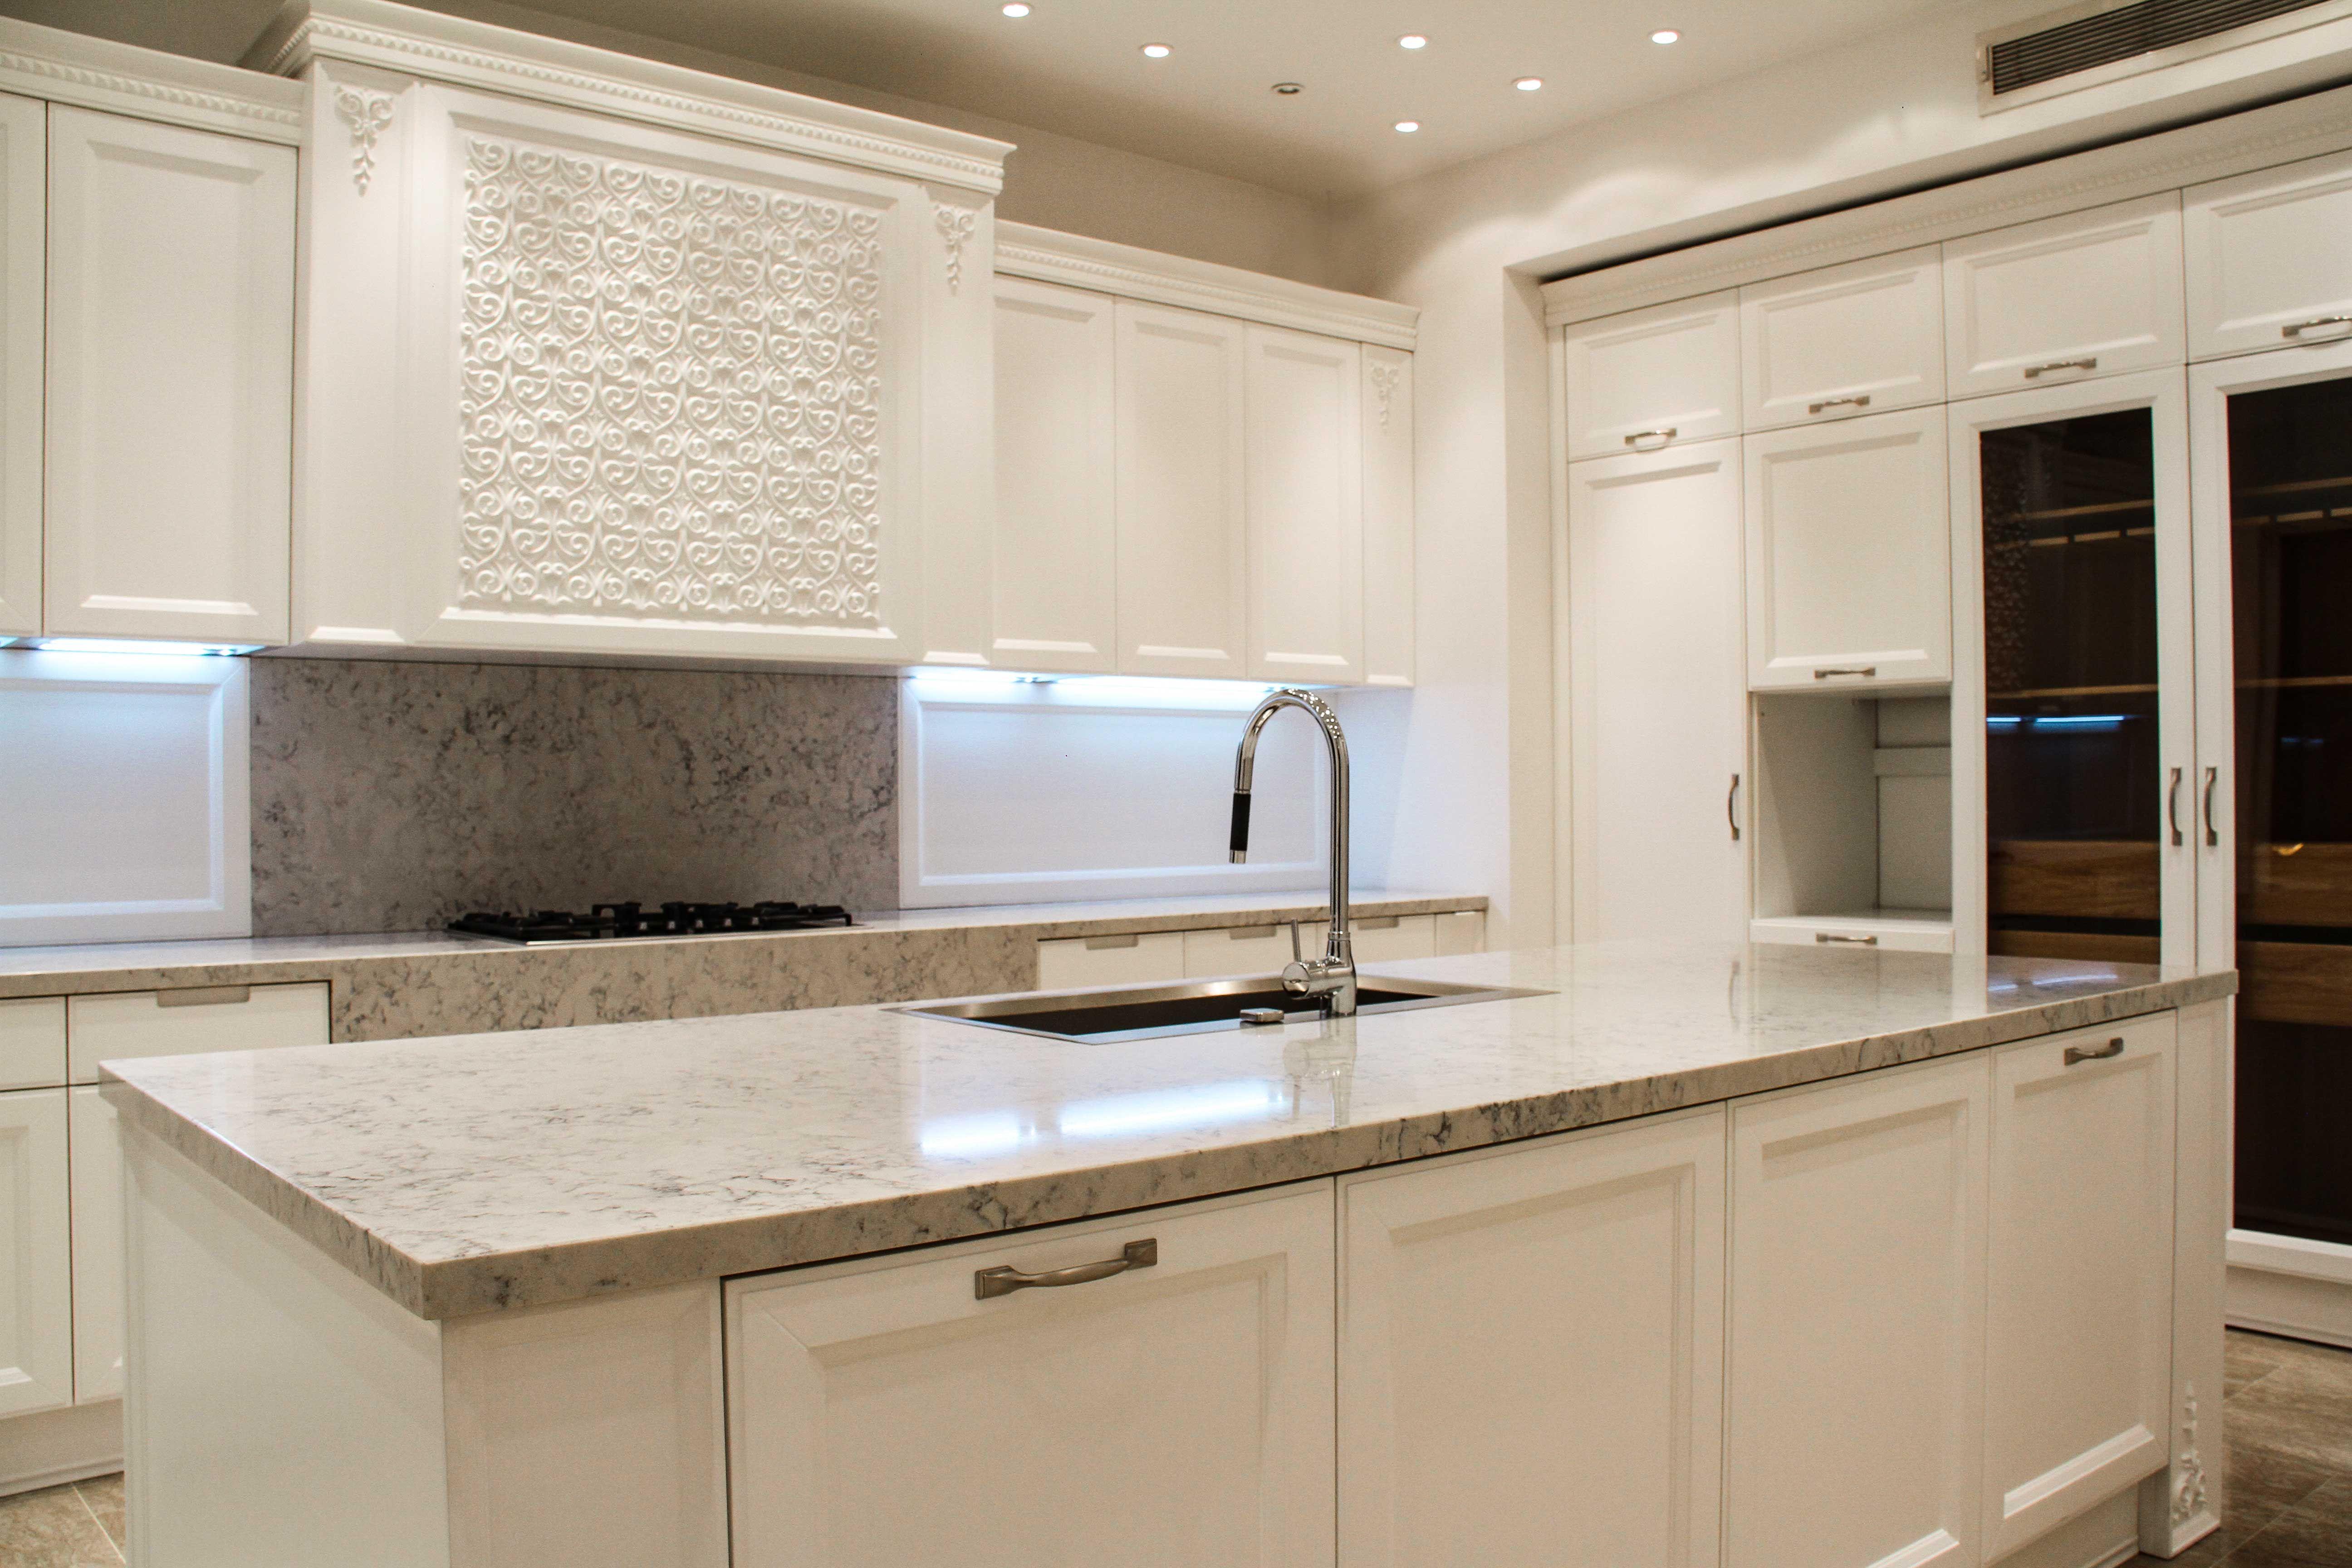 Classic Kitchen Cabinet Design Classic Kitchen Cabinets Classic Kitchens Kitchen